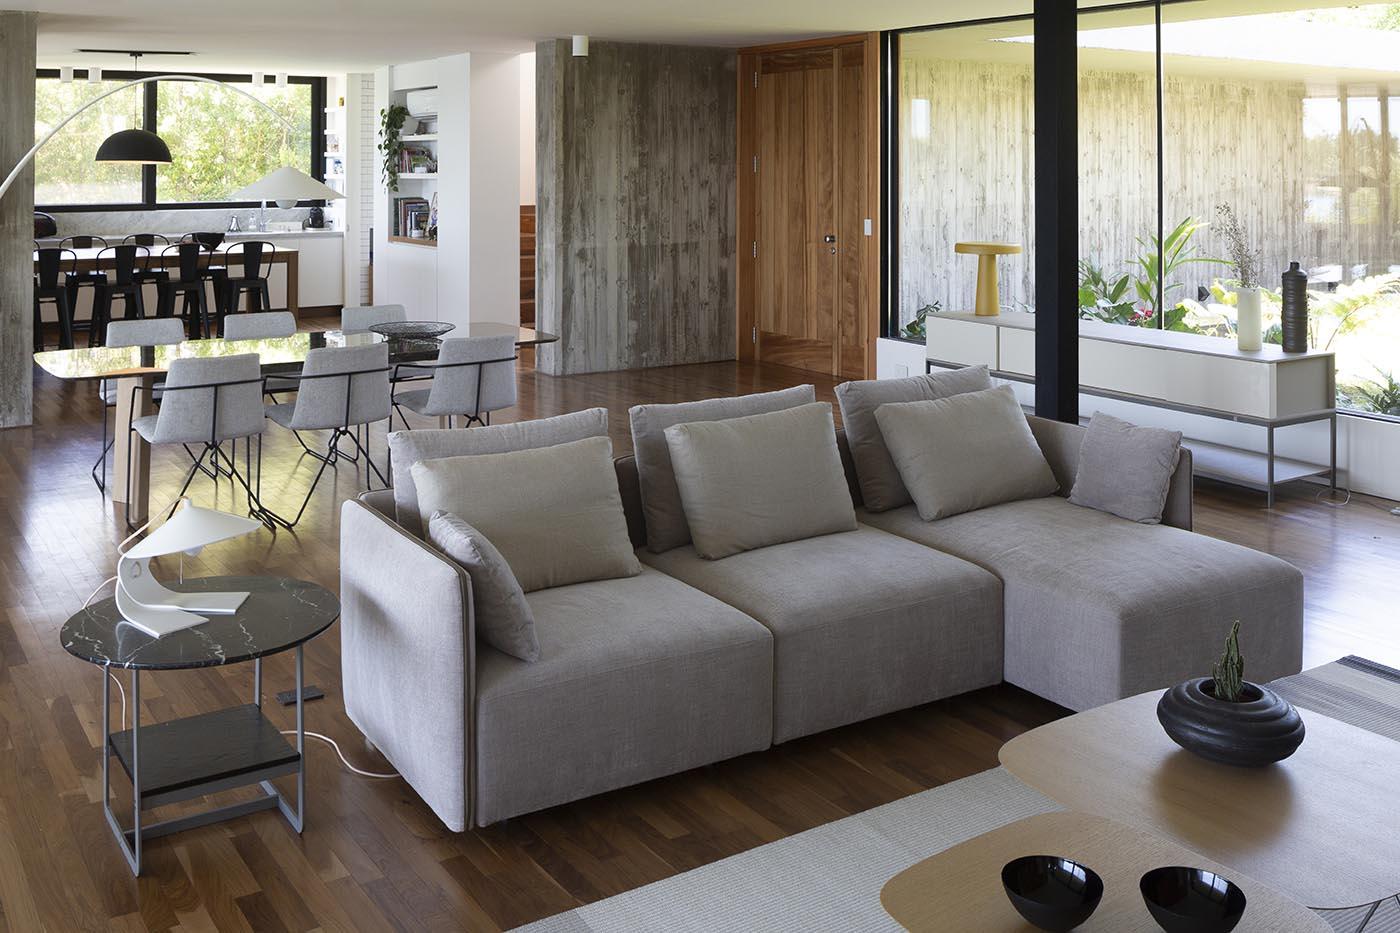 Sofa Carl fCH